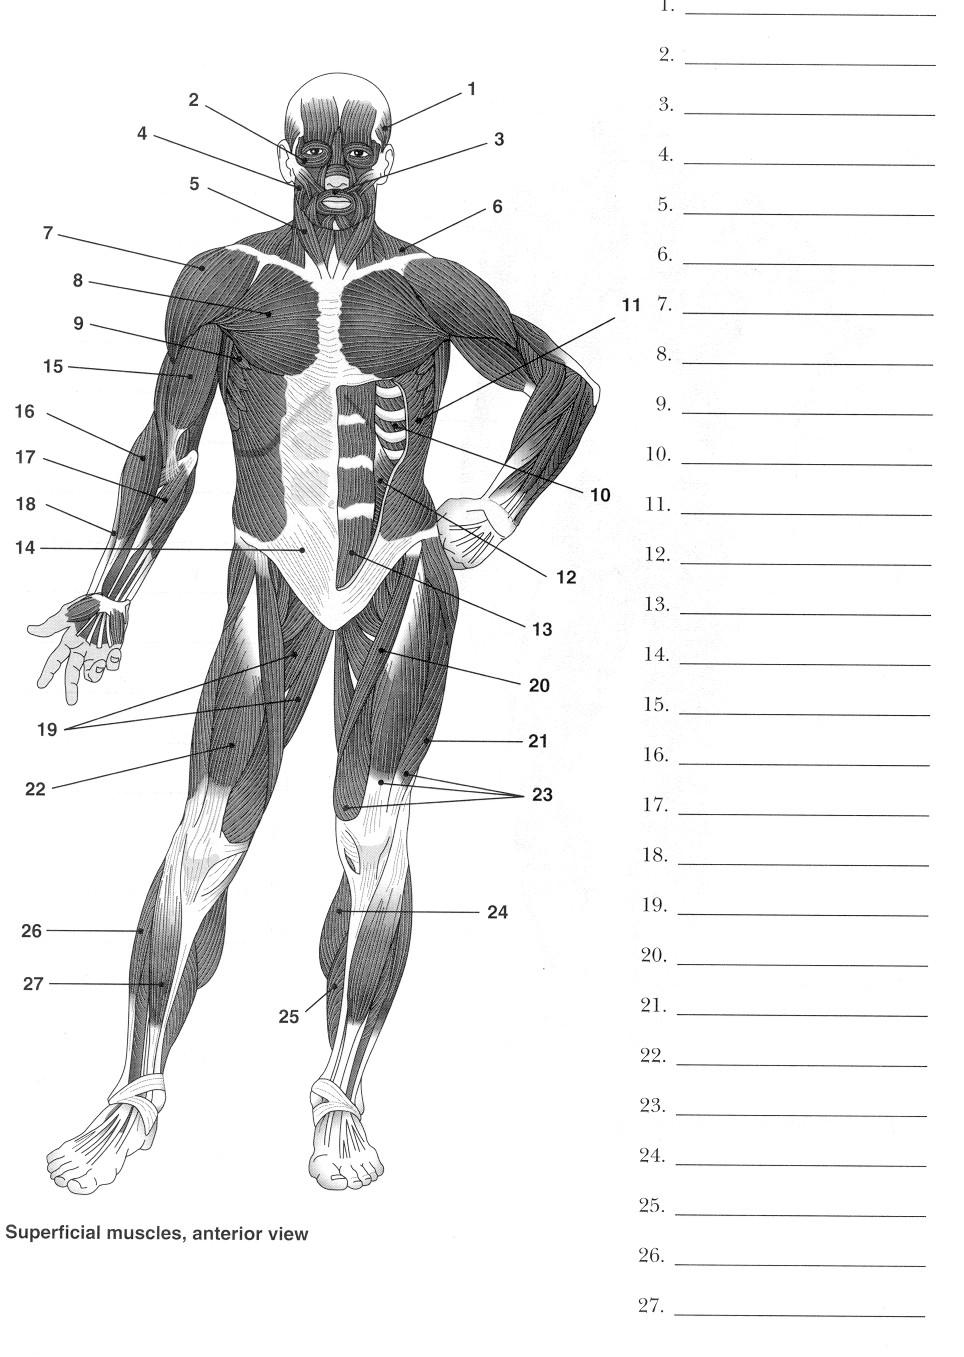 endocrine system diagram minn kota 36 volt trolling motor wiring 16 best images of muscle worksheets for middle school - muscular printable ...